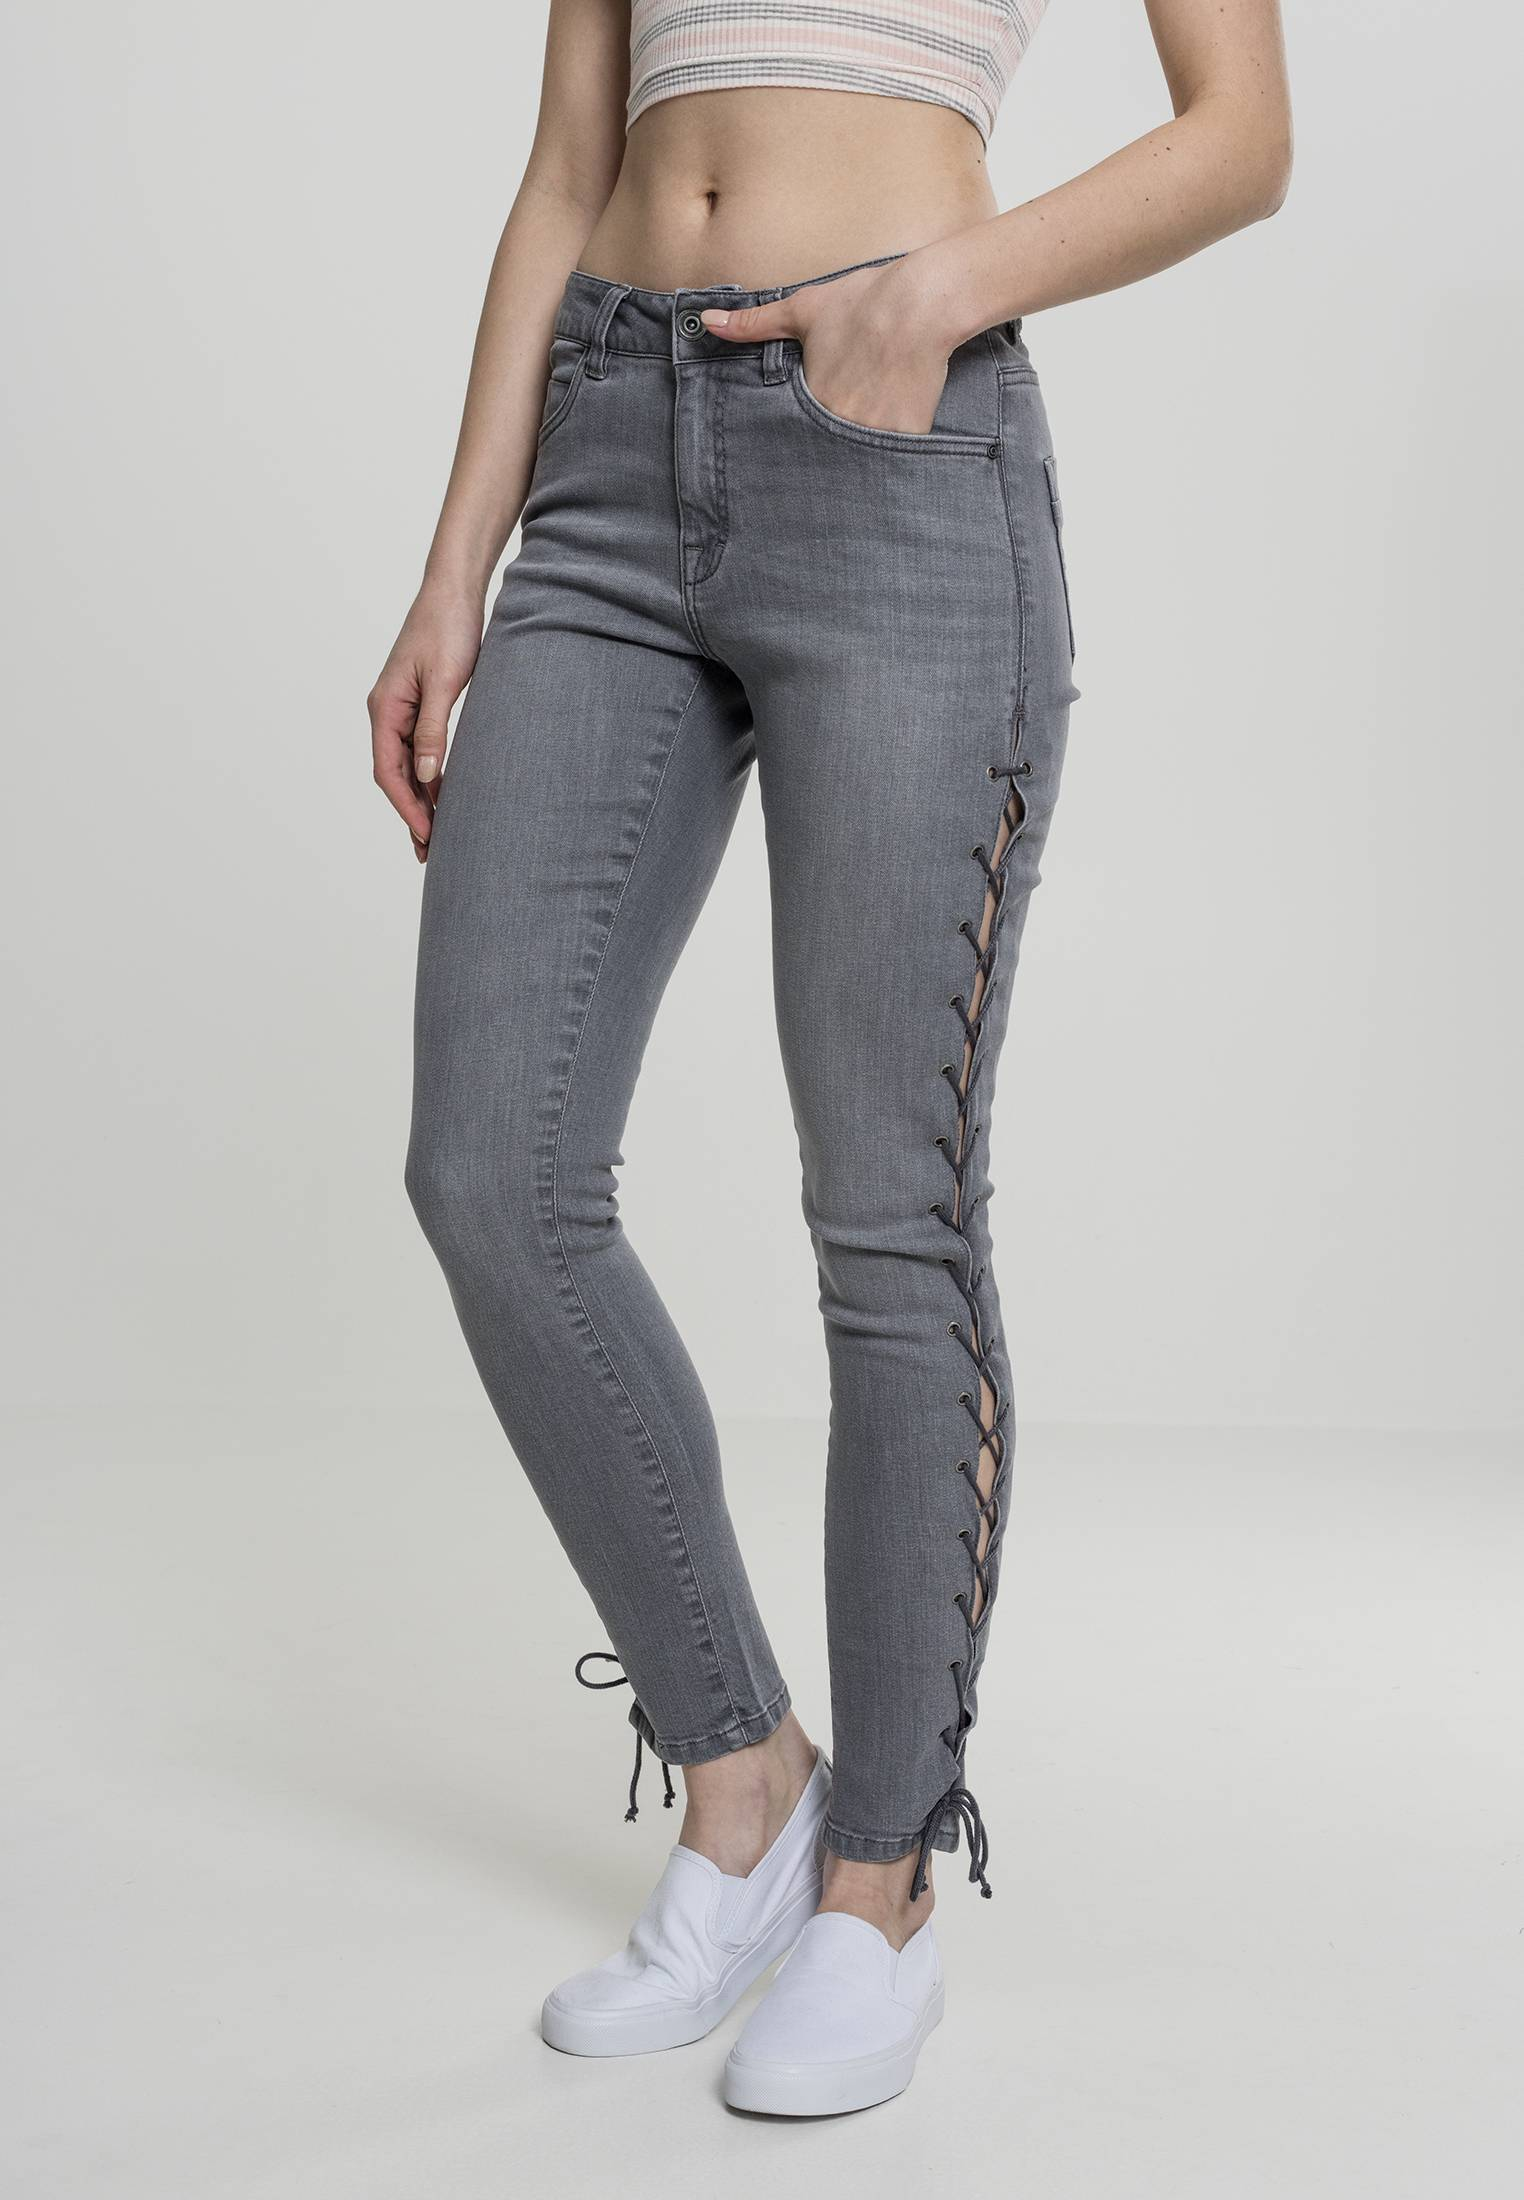 Urban Classics Ladies Denim Lace Up Skinny Pants grey - 26